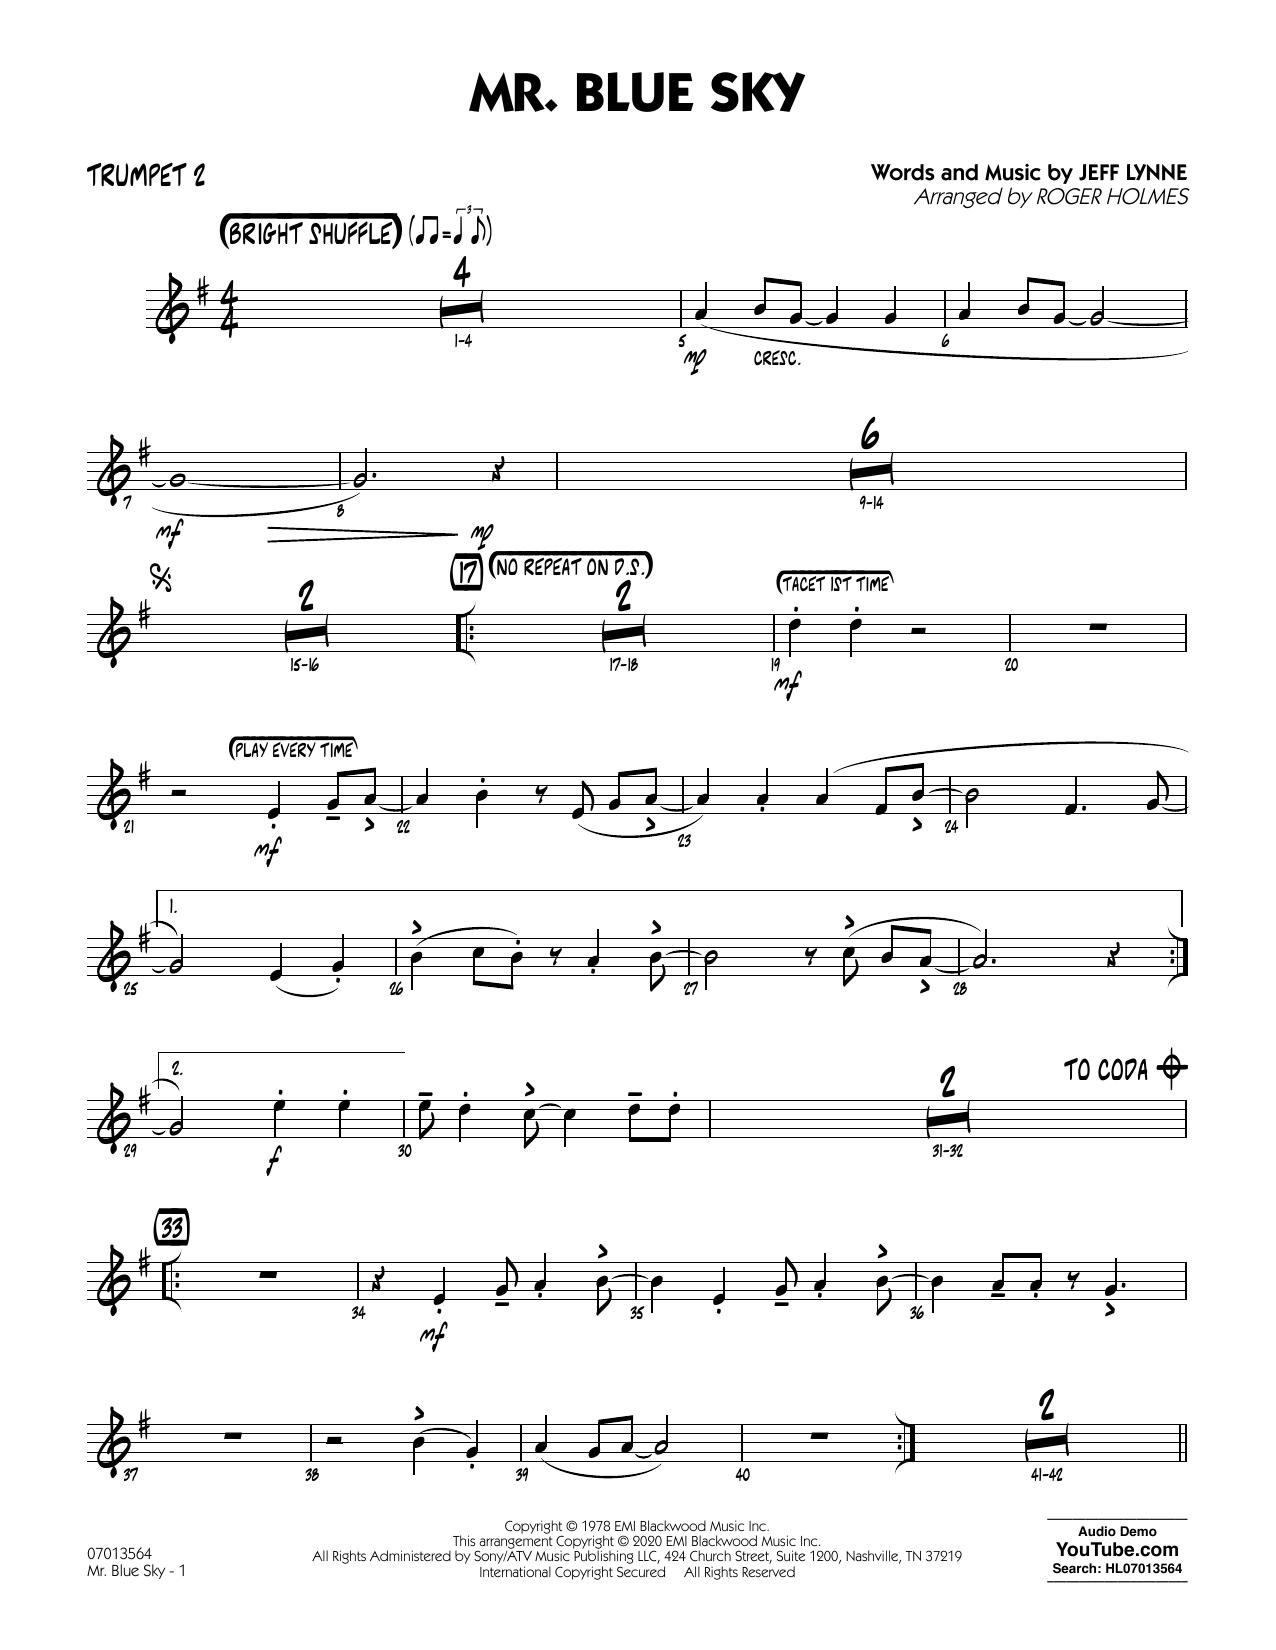 Mr. Blue Sky (arr. Roger Holmes) - Trumpet 2 (Jazz Ensemble)